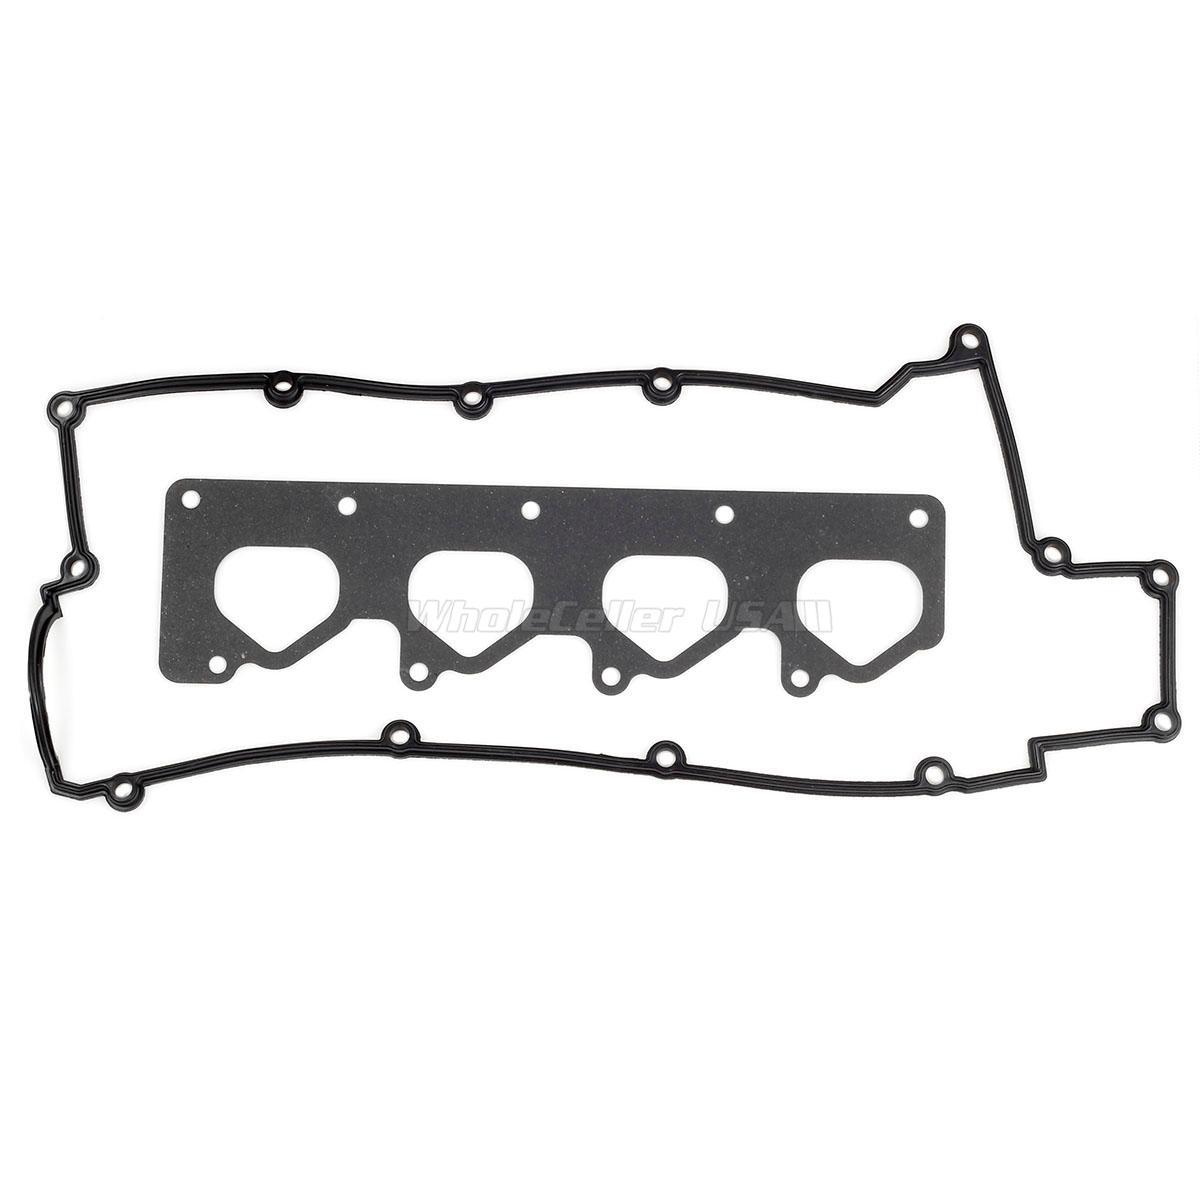 Cylinder Head Gasket kit for 02-09 Hyundai Tiburon Tucson